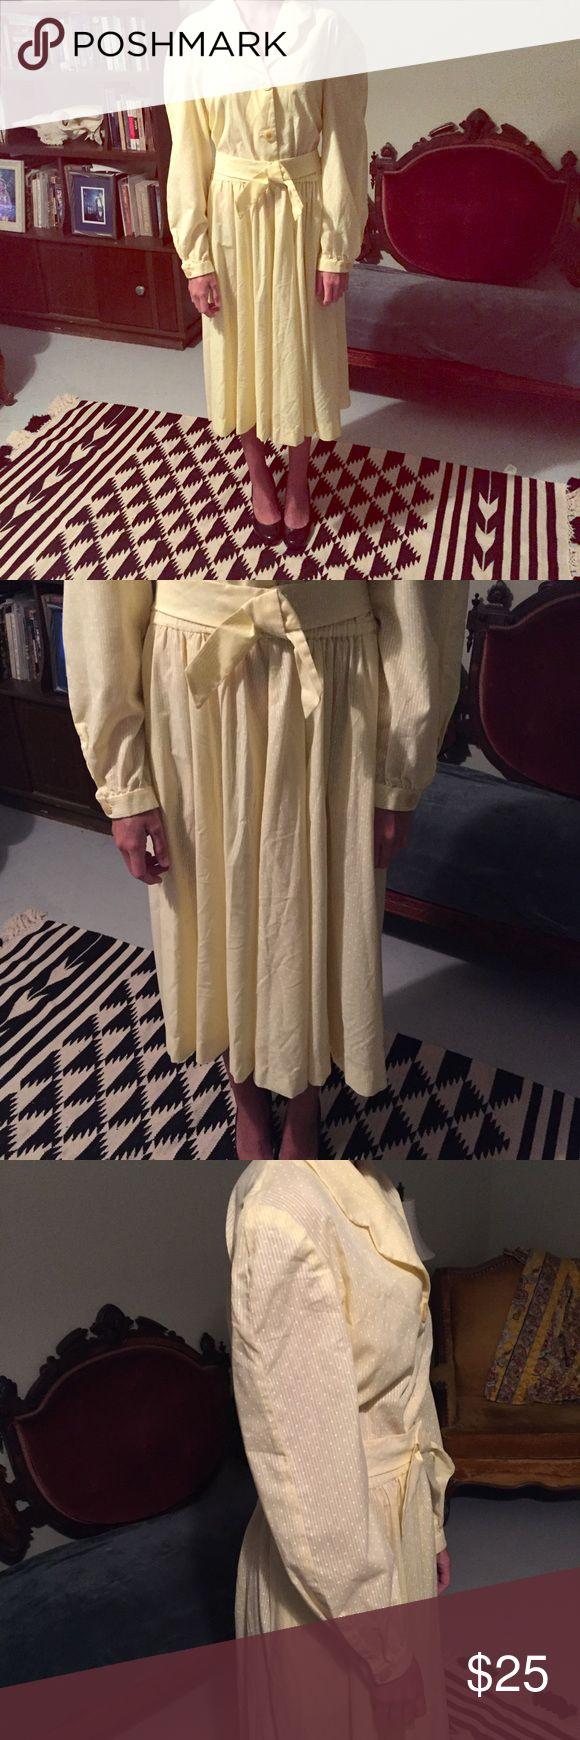 Vintage 50s style yellow June Cleaver Dress sz L? Vintage 50s style yellow cotton June Cleaver Dress sz L? No label, comes with matching non adjustable bow. belt.... Dresses Midi